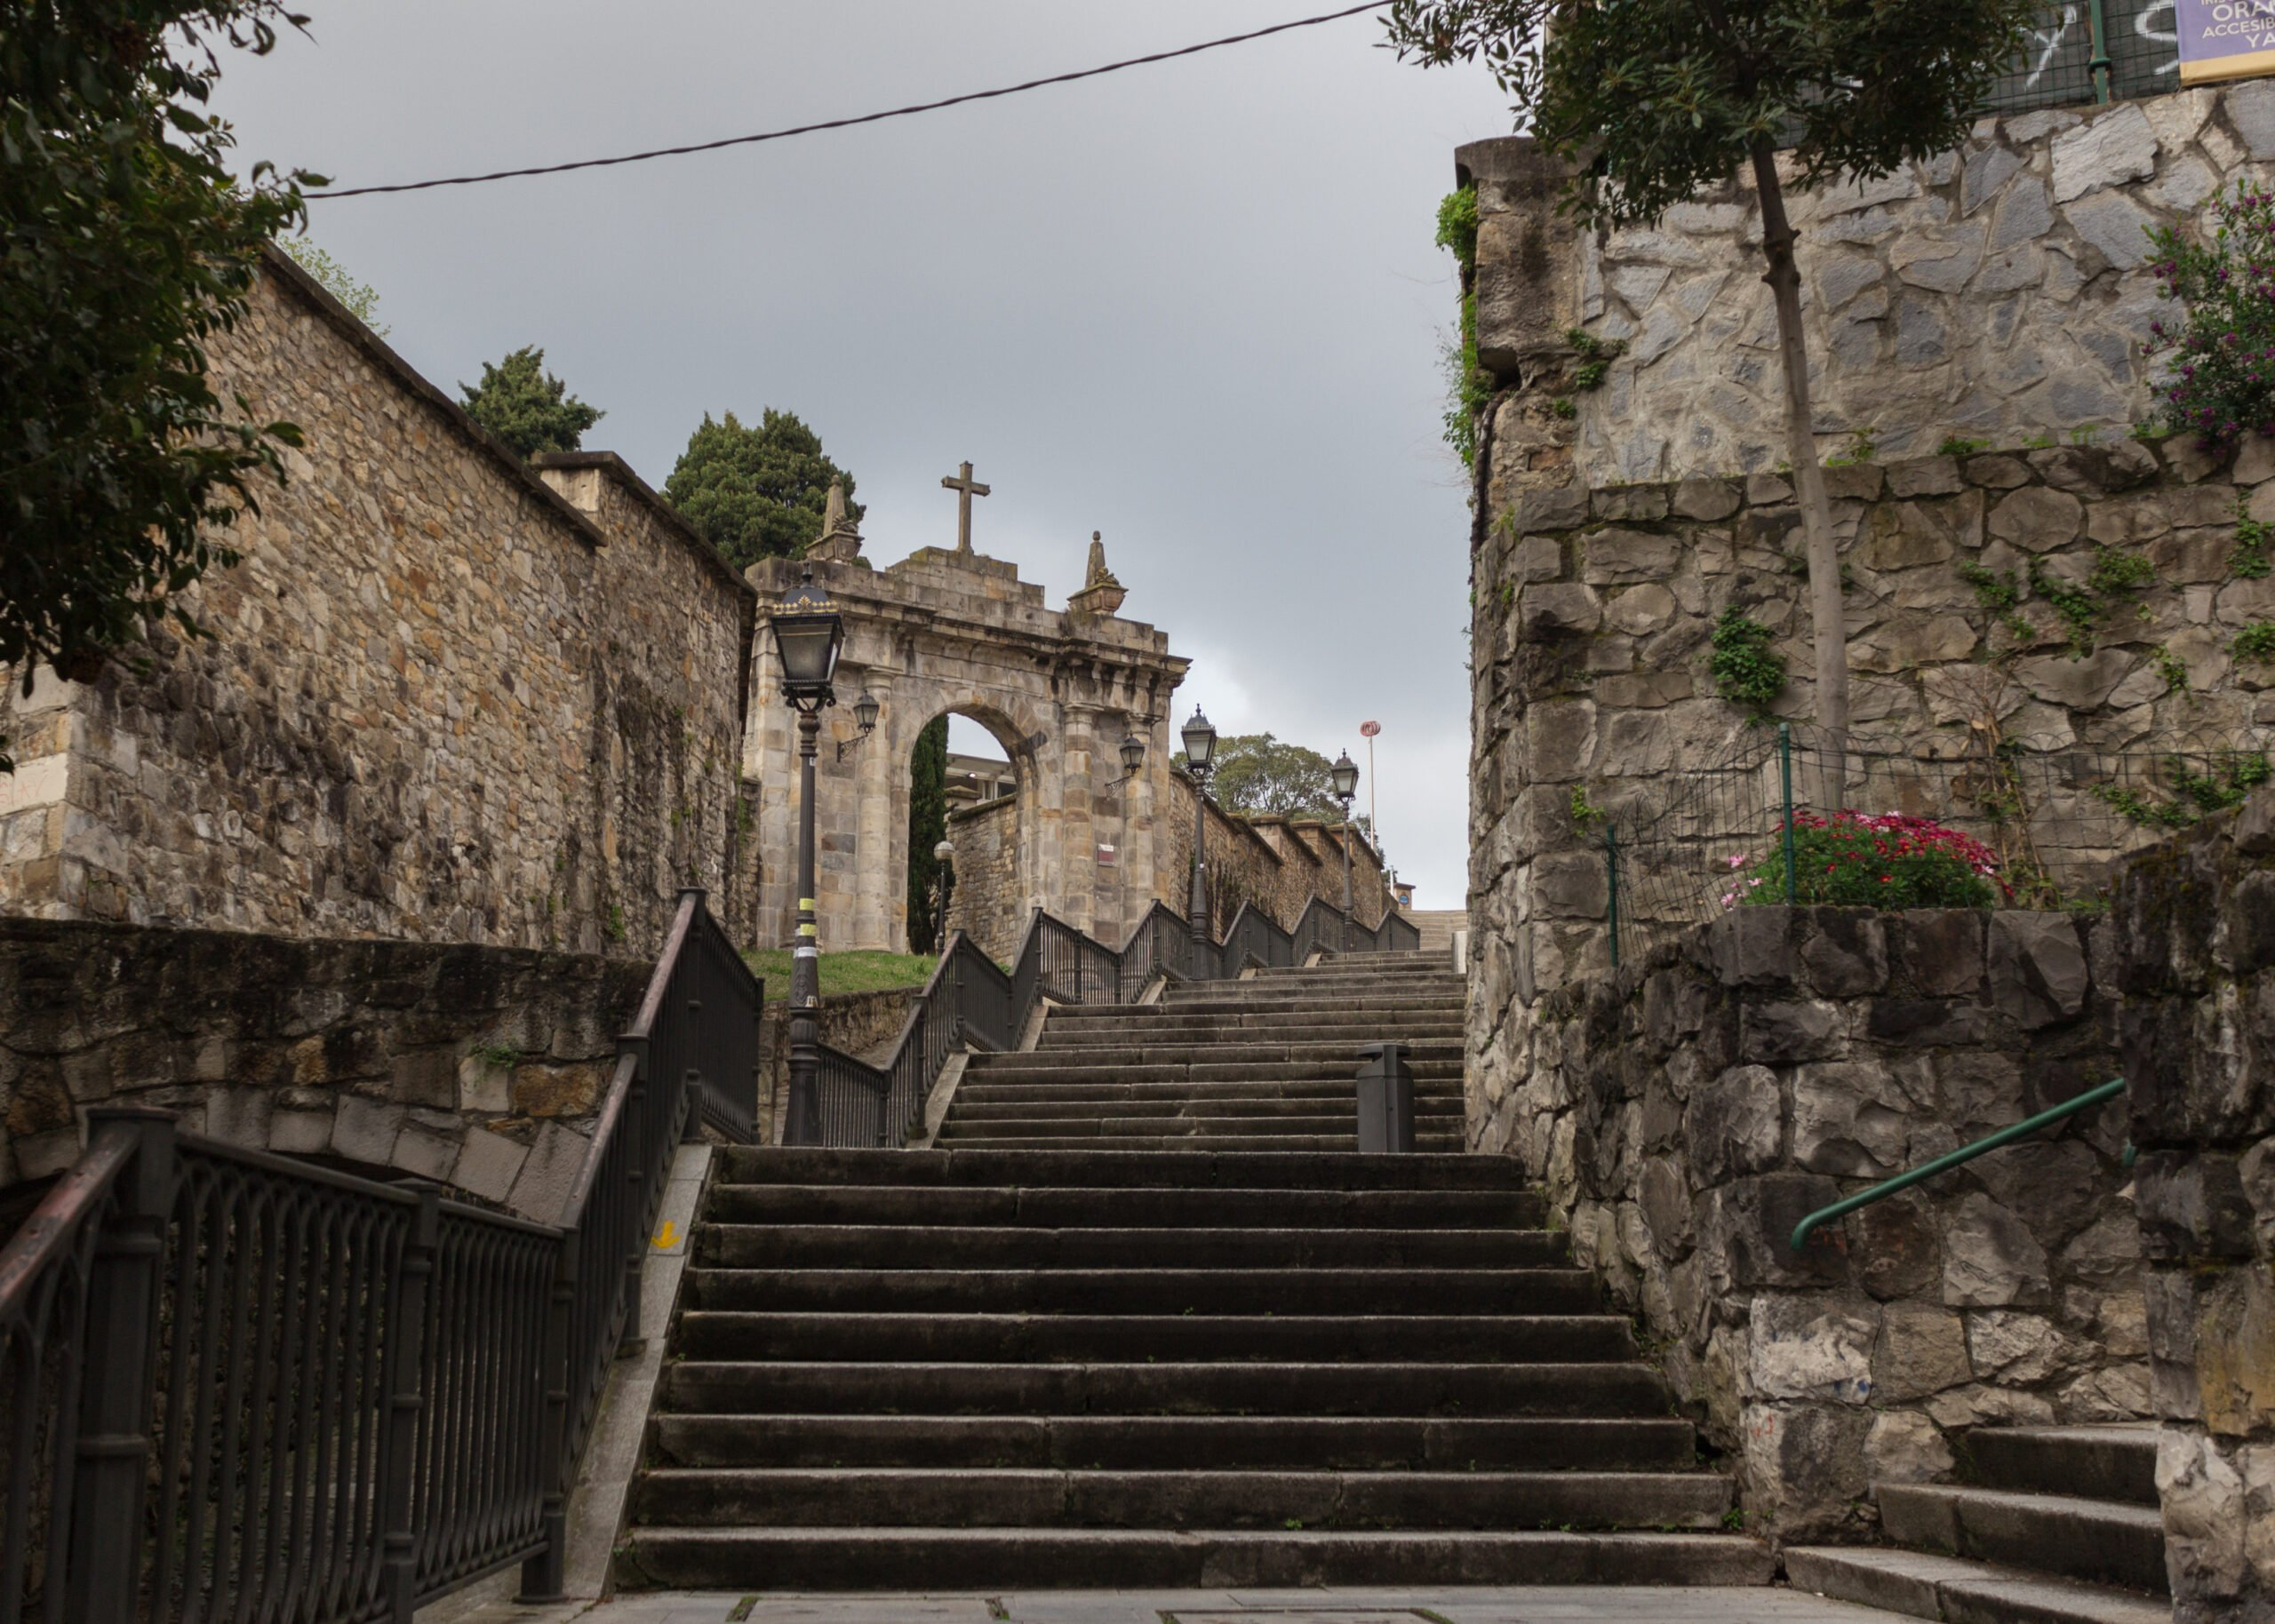 Discover The Old City Of Bilboa On The Txakoli Wine Tasting Tour From Bilbao